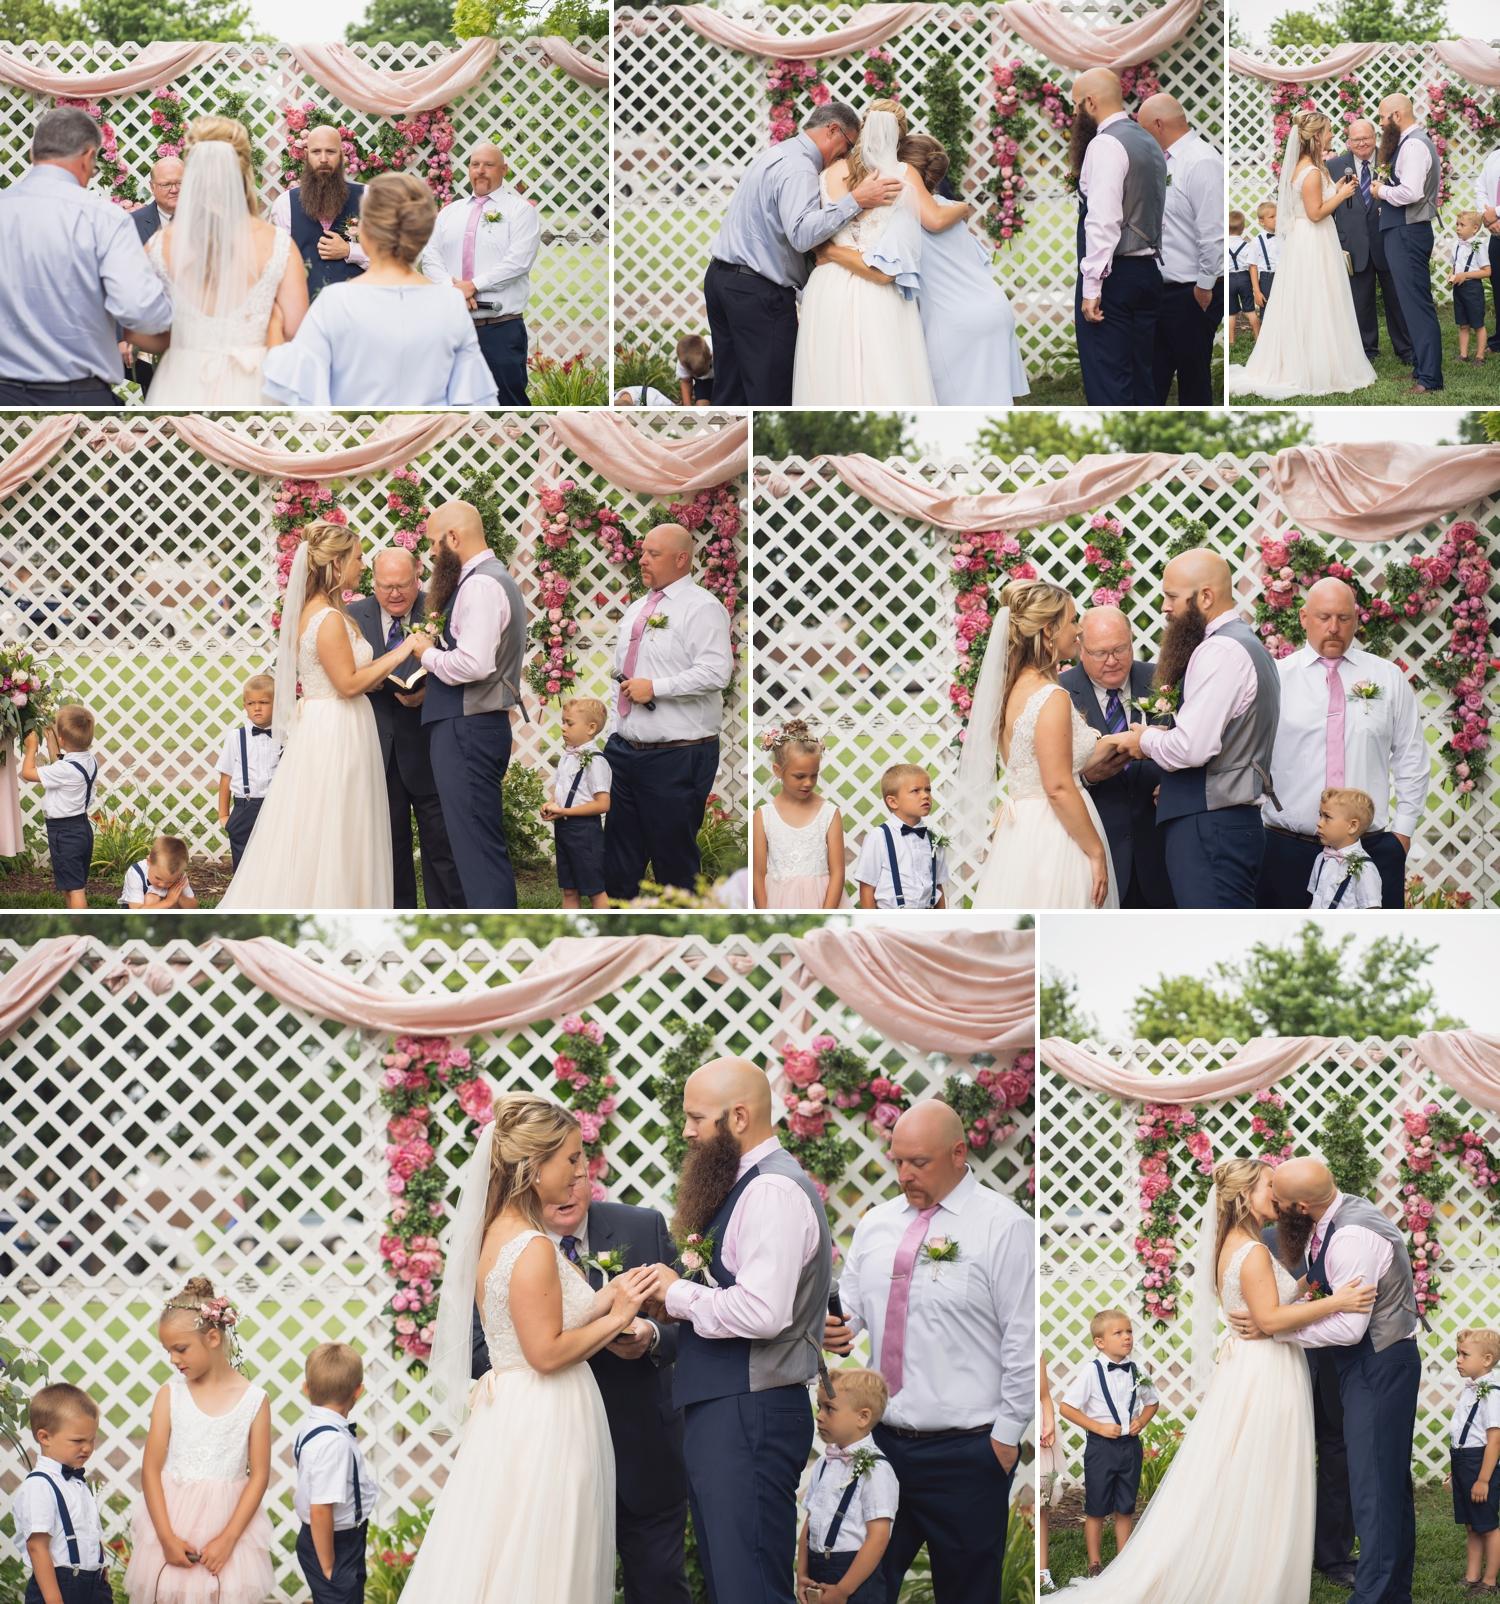 Baker Arts Liberal Wedding 5.jpg